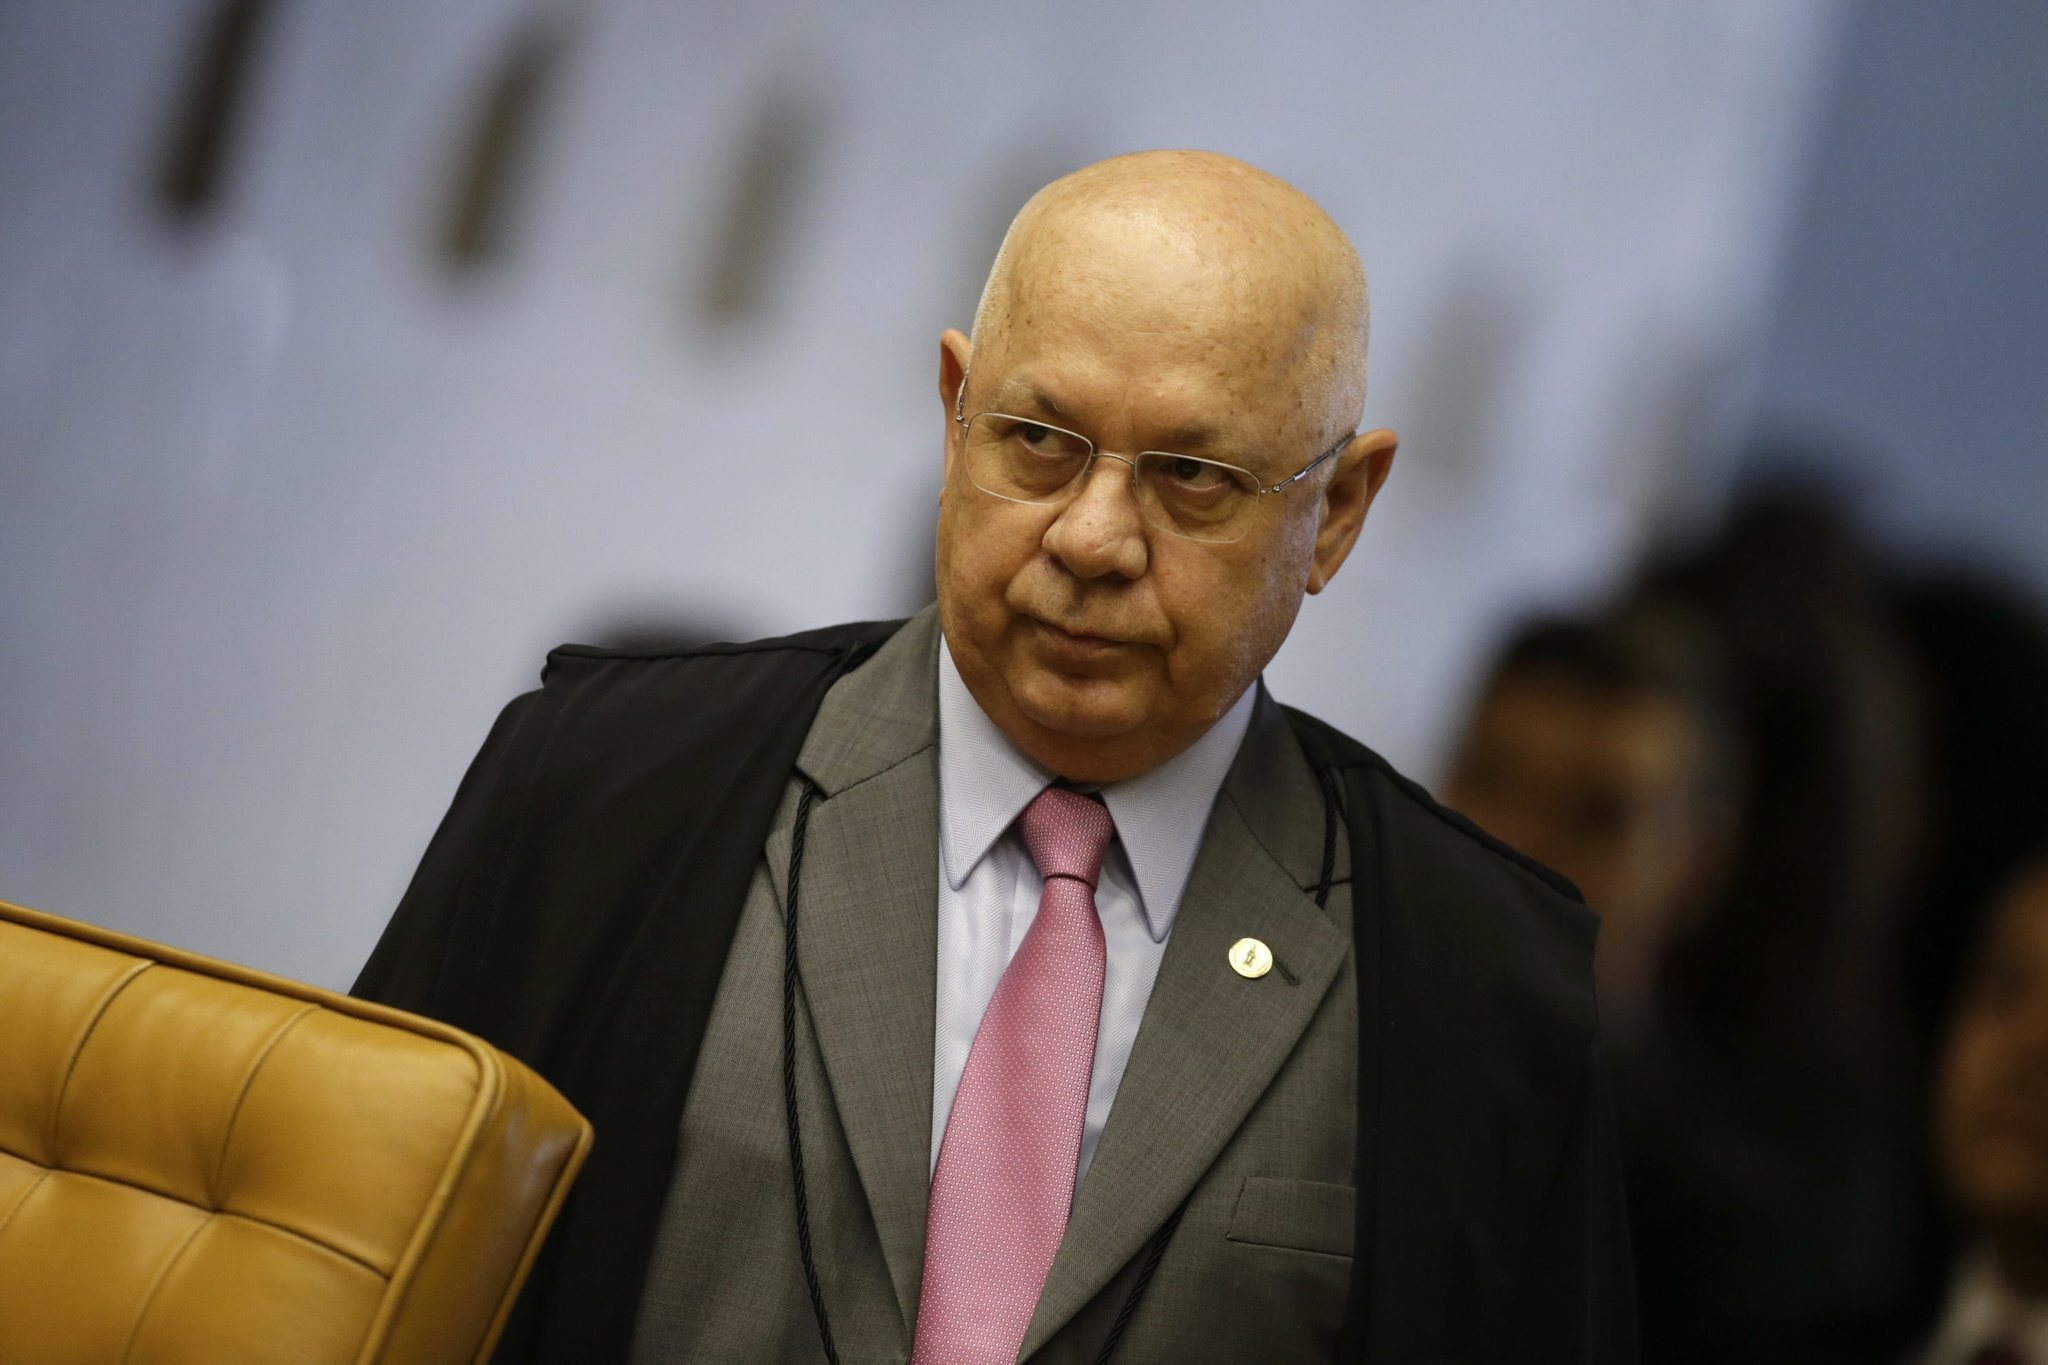 Death of Brazilian Supreme Court Judge Raises Concerns In State Corruption Case